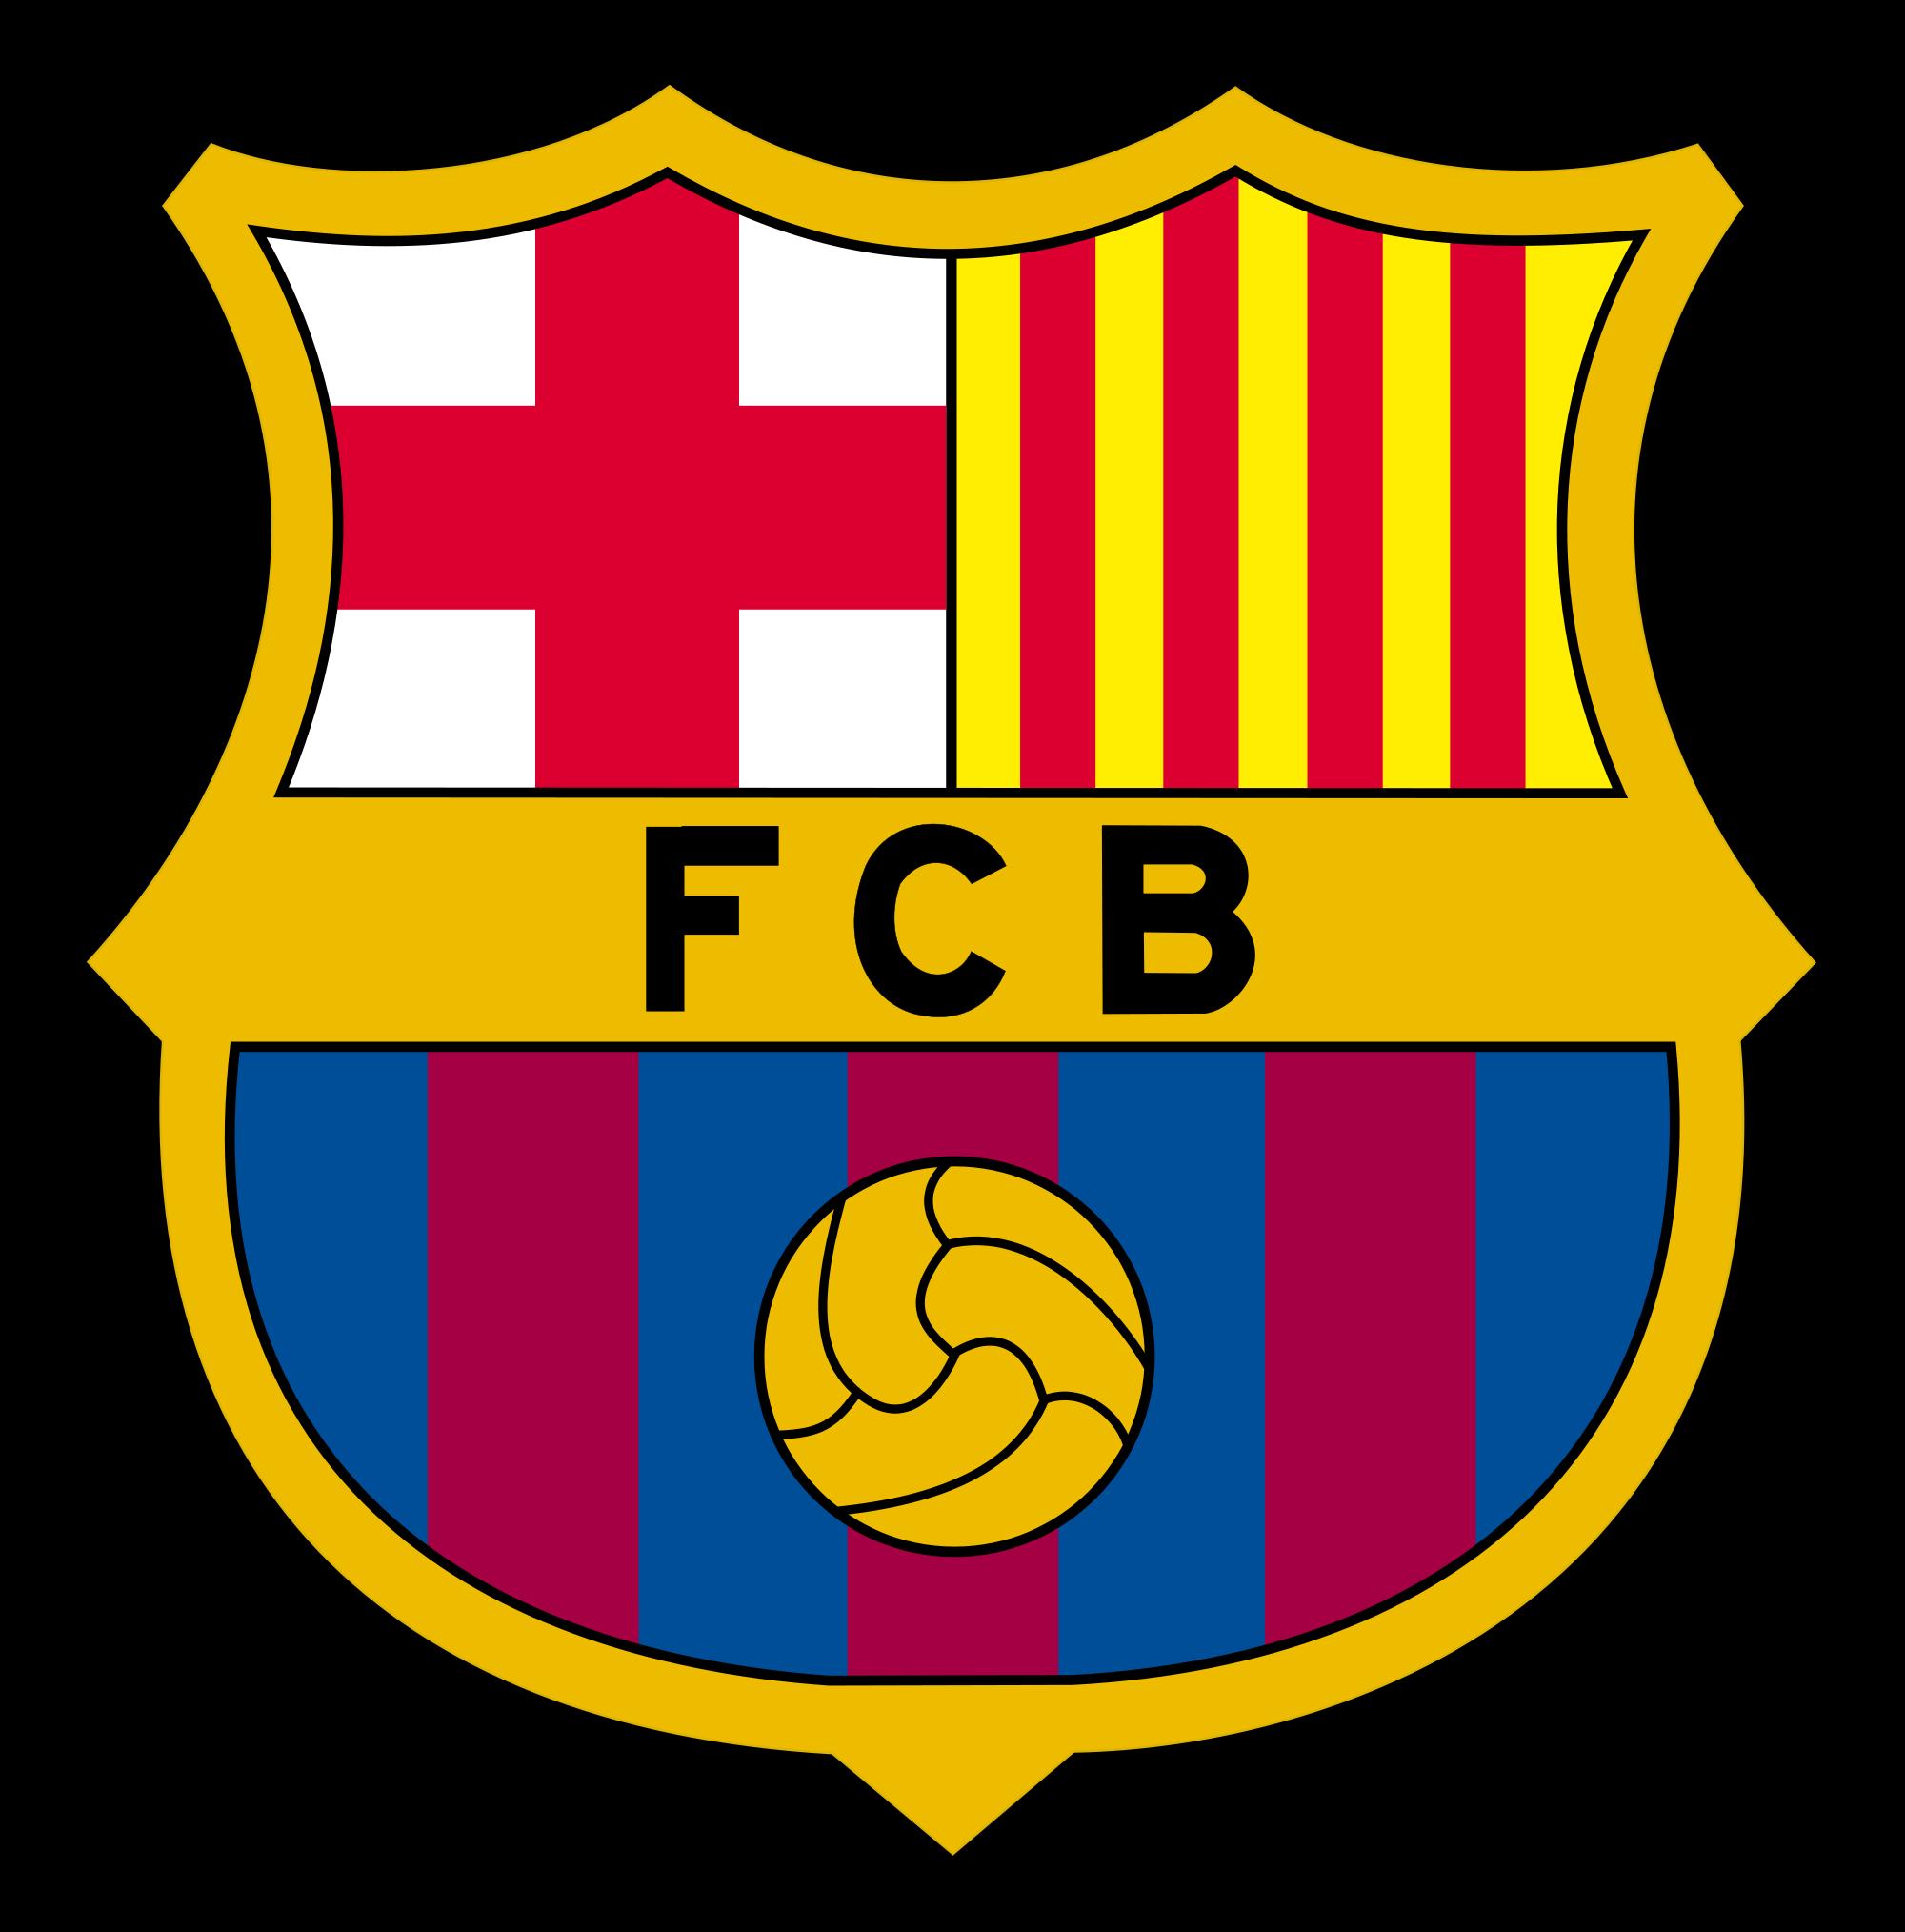 FC Barcelona Logo Football Club